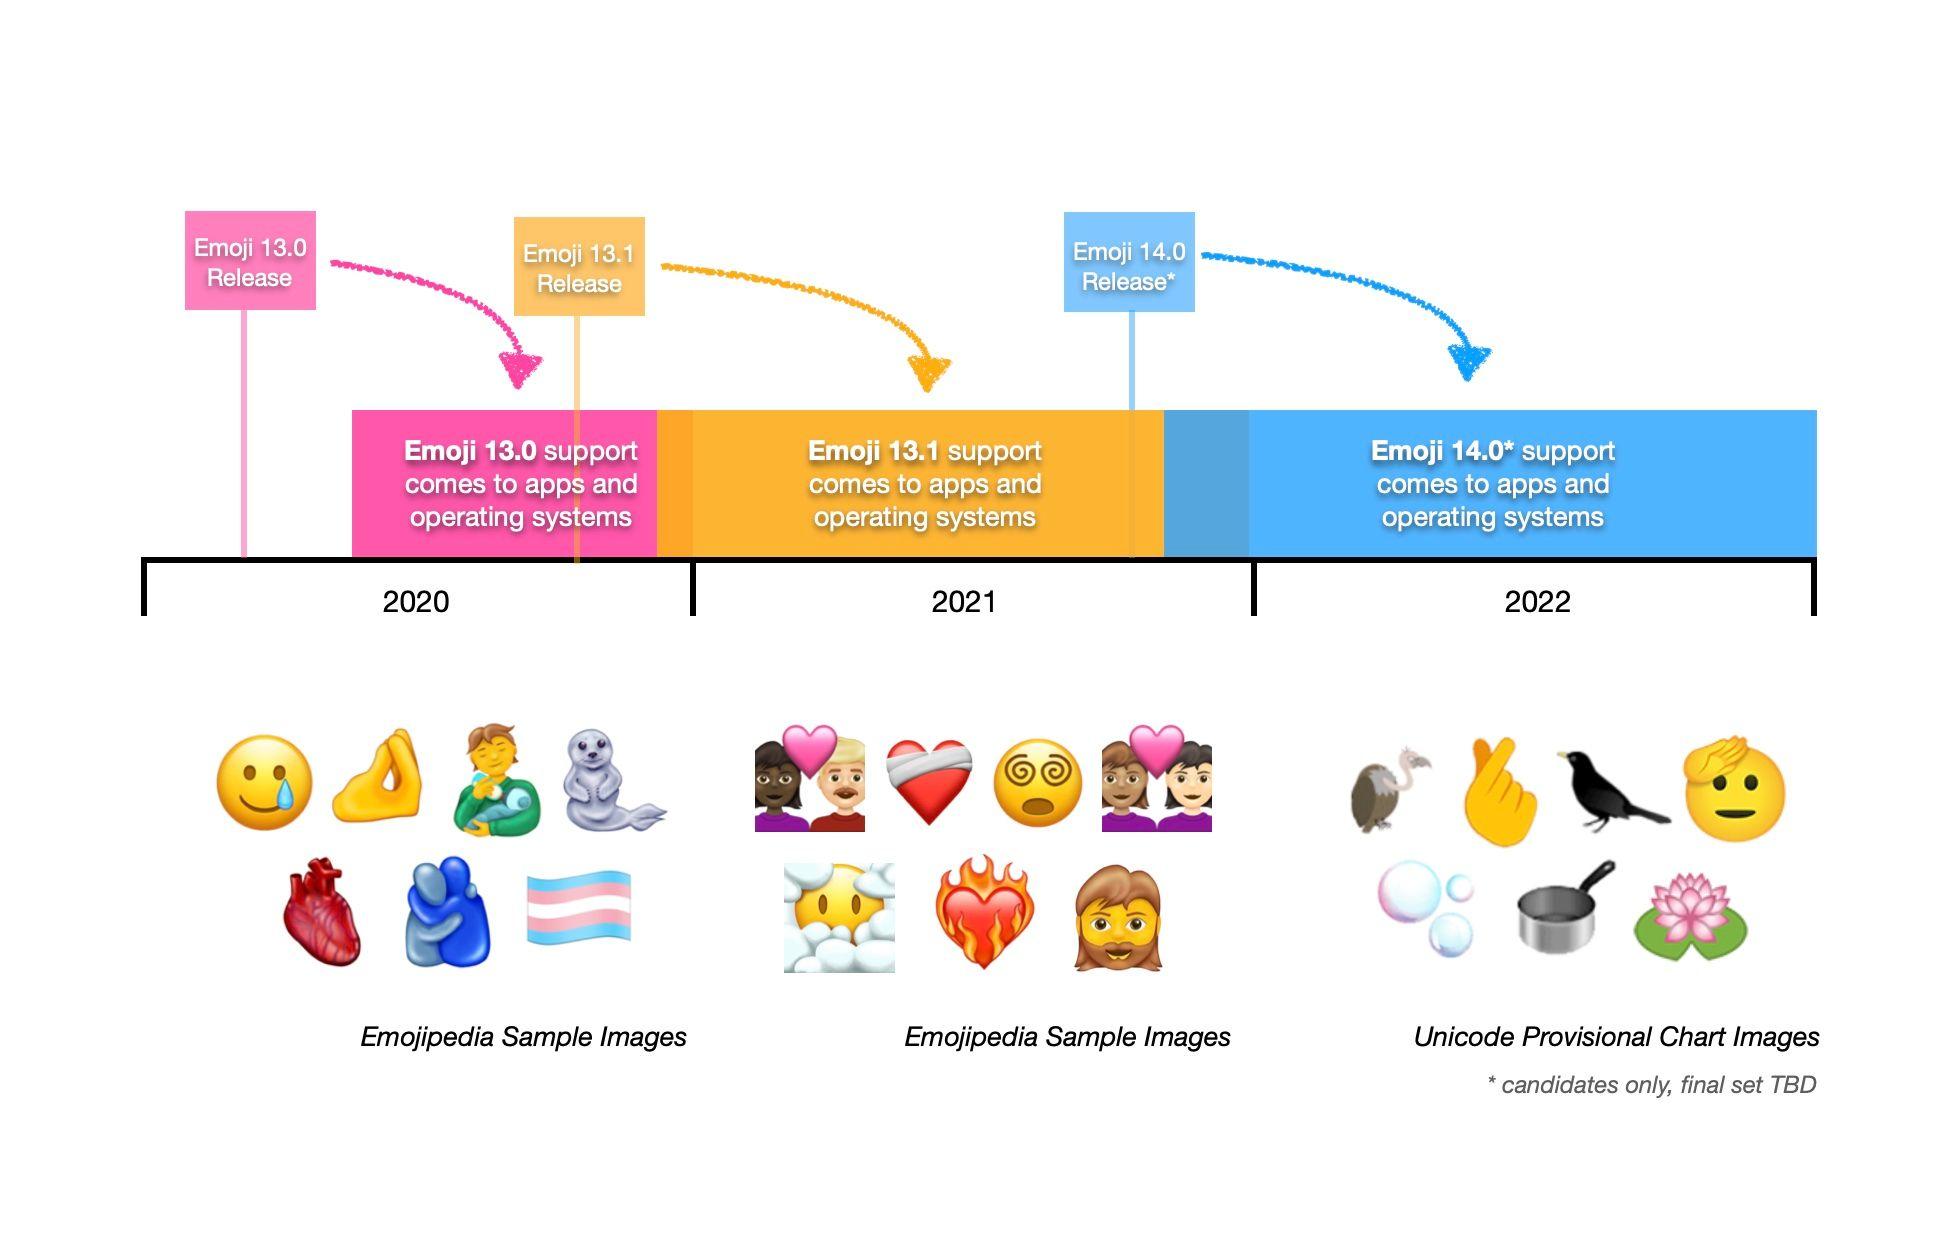 emoji roadmap 2021 2022 futures versions